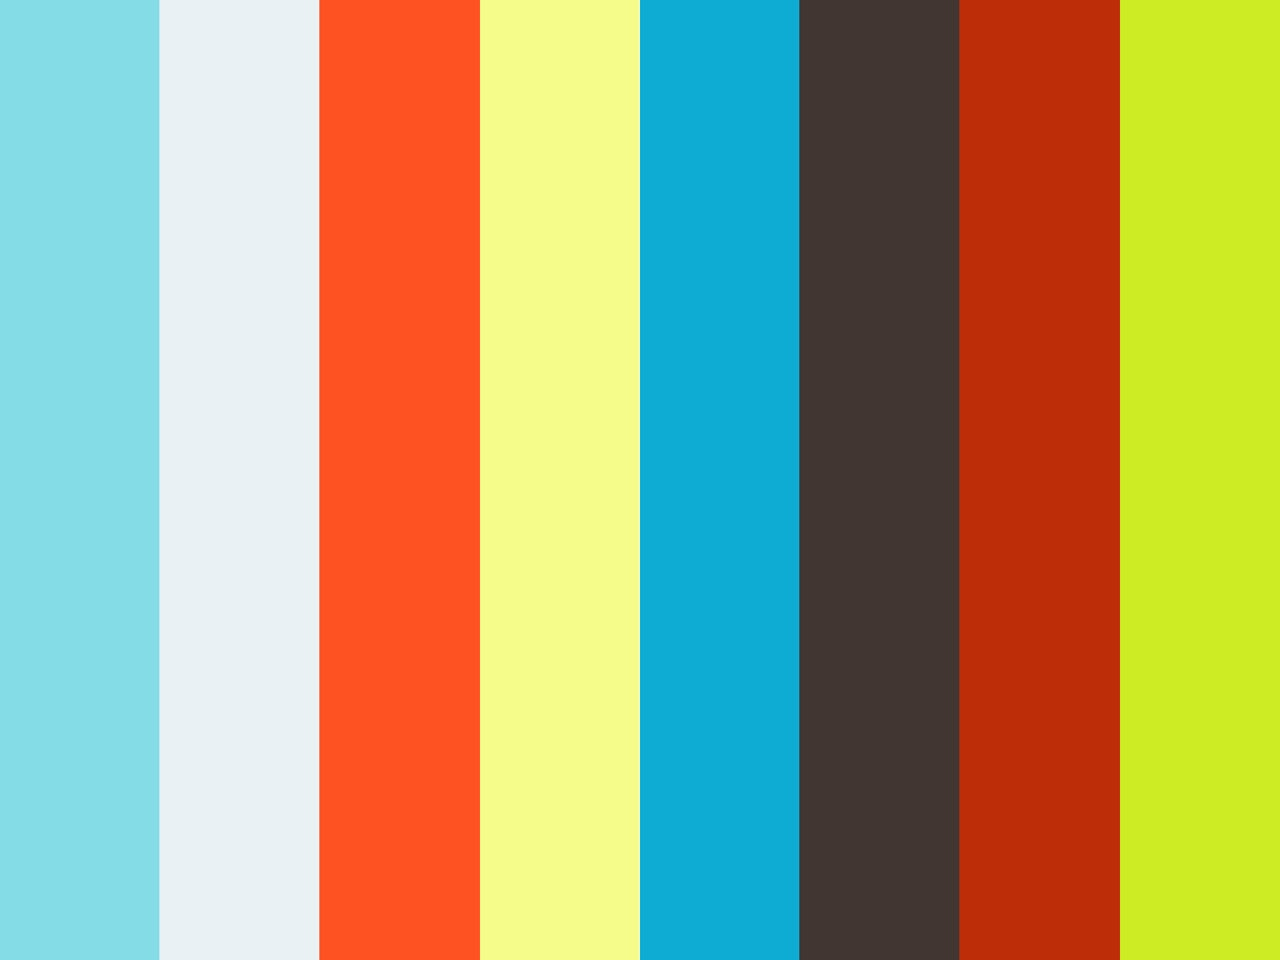 1. Mai 2017: Autonome gegen ein Familienfest der AfD